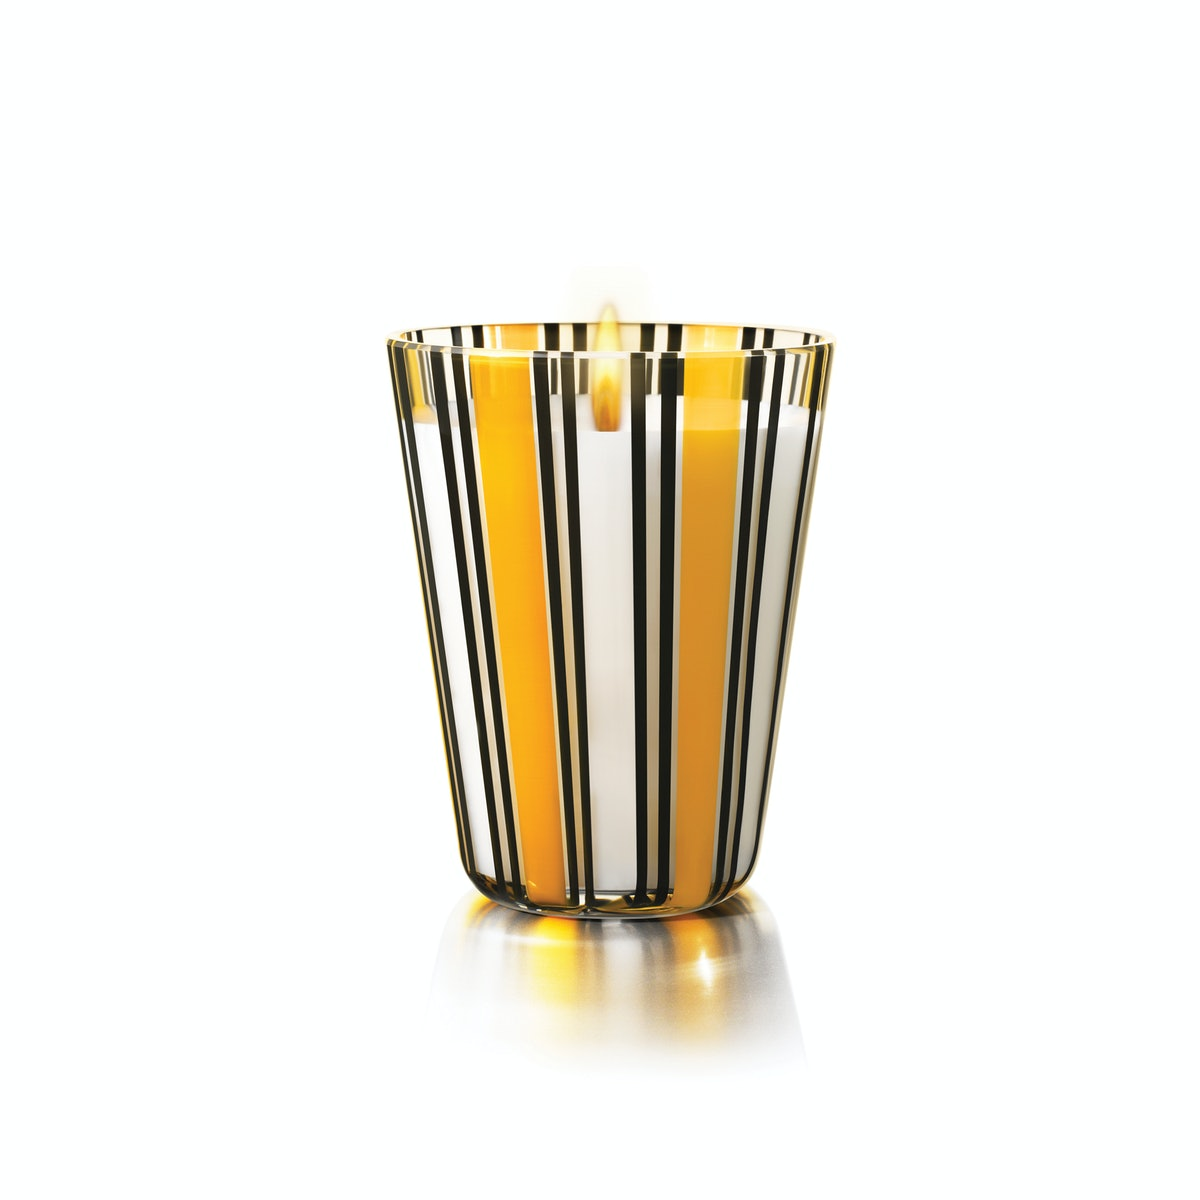 Acqua di Parma Perfumed Candle in Linden in Murano glass